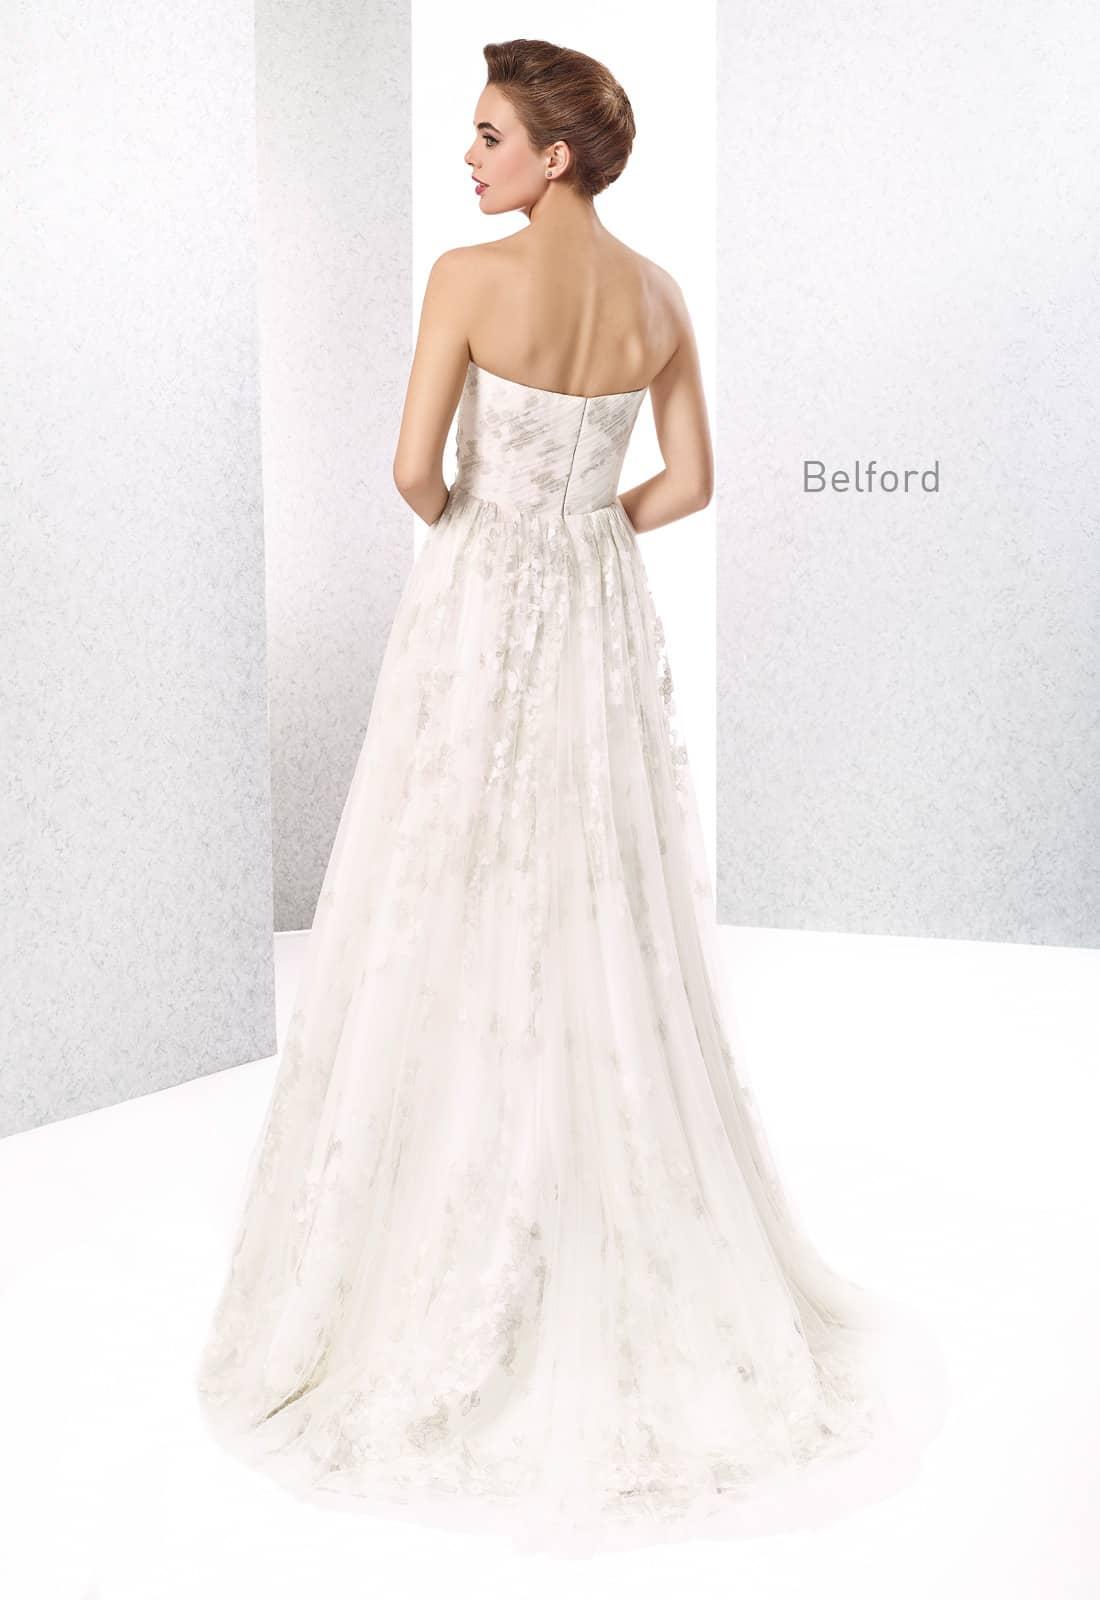 Patrick belford wedding